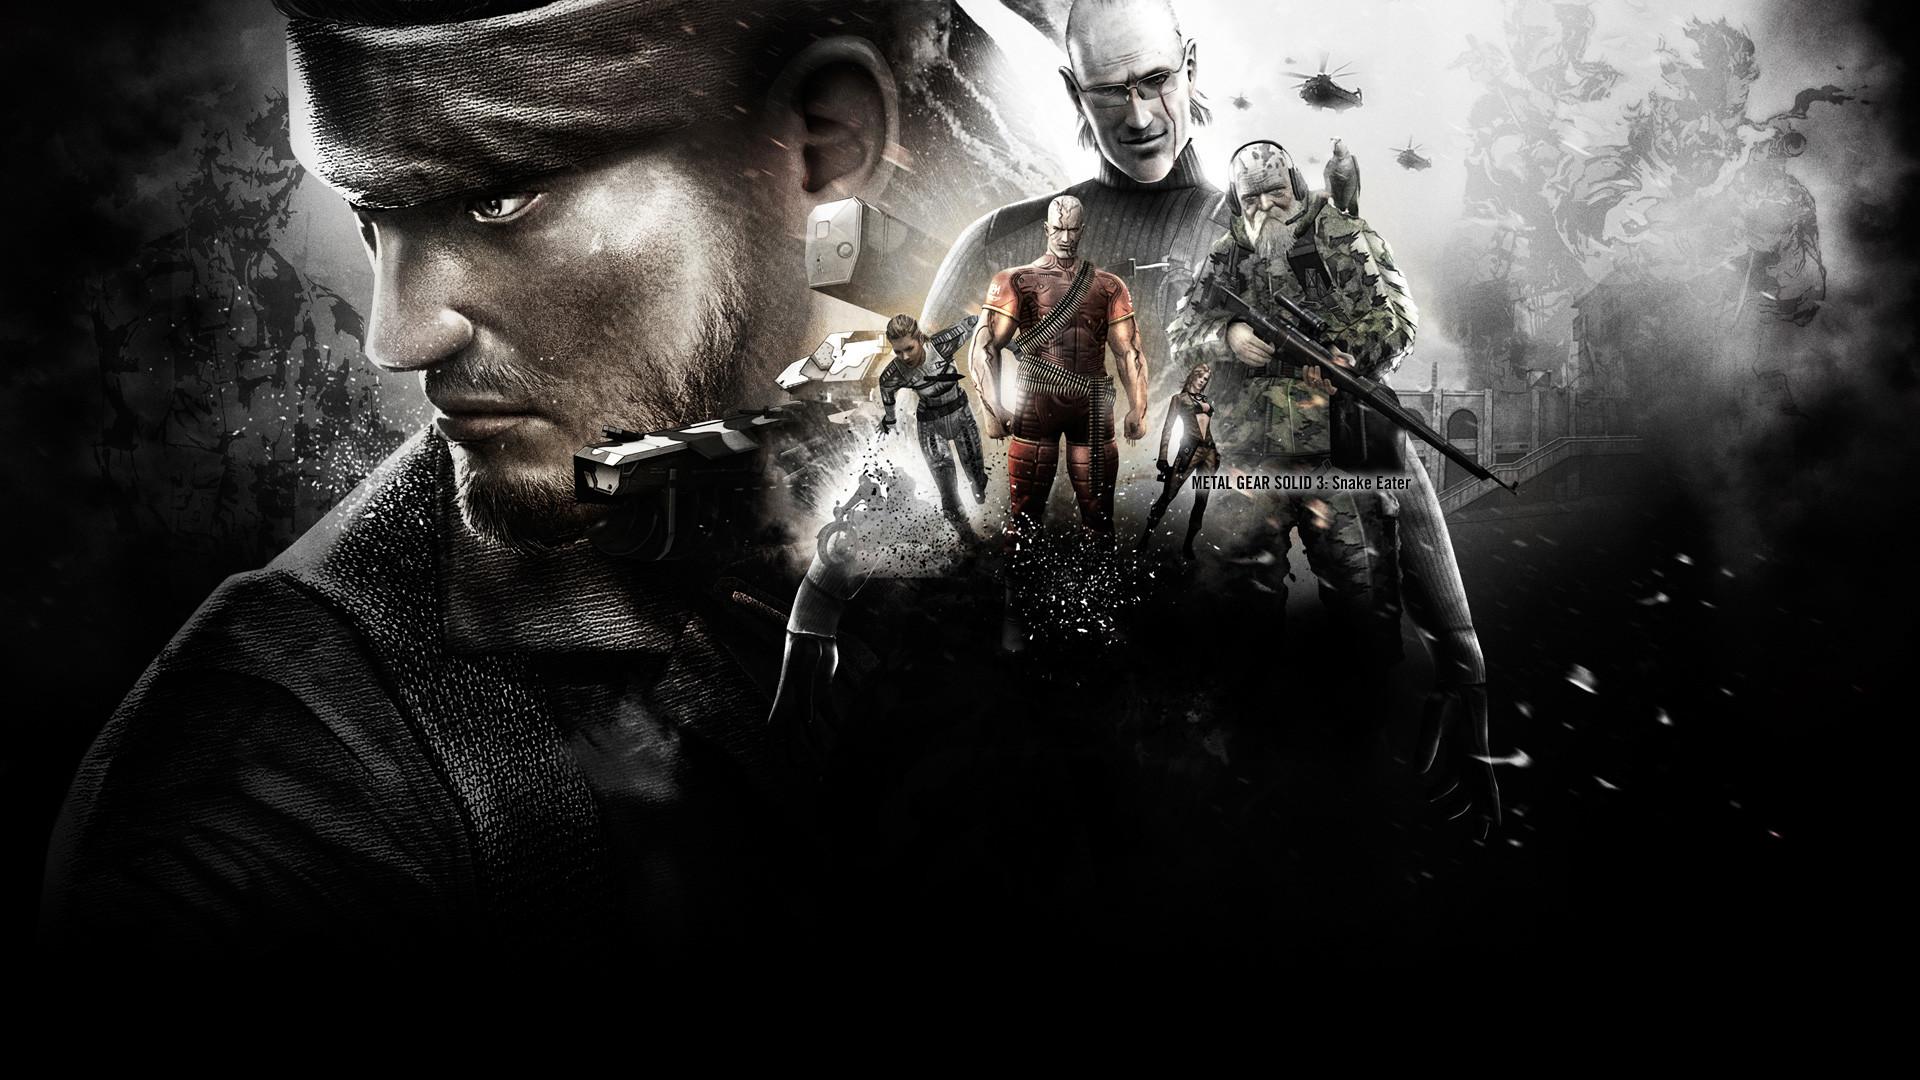 Metal Gear Solid V | game hd wallpaper | Pinterest | Metal gear solid, Metal  gear and Hd wallpaper